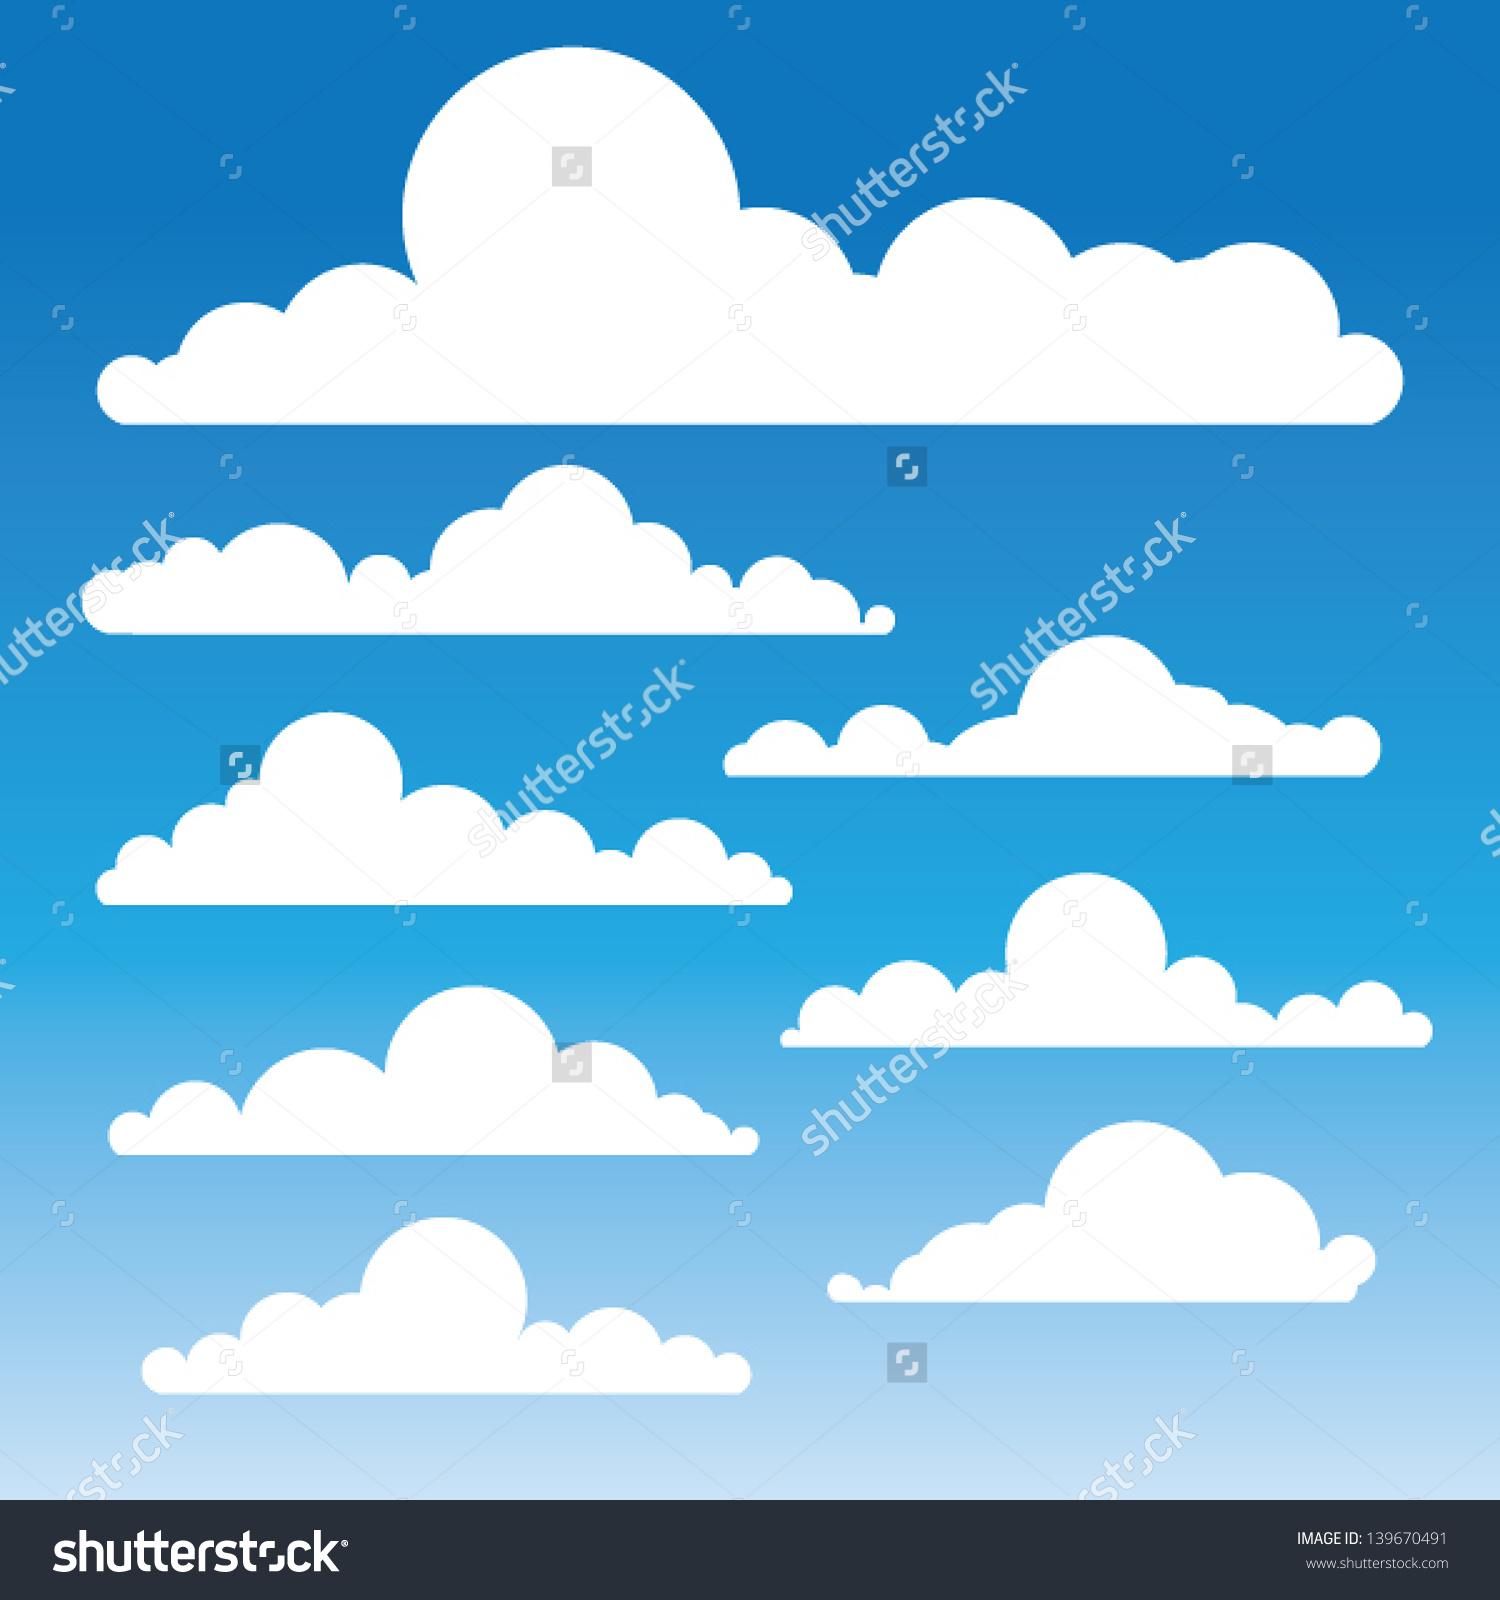 Clipart cloud silhouette.